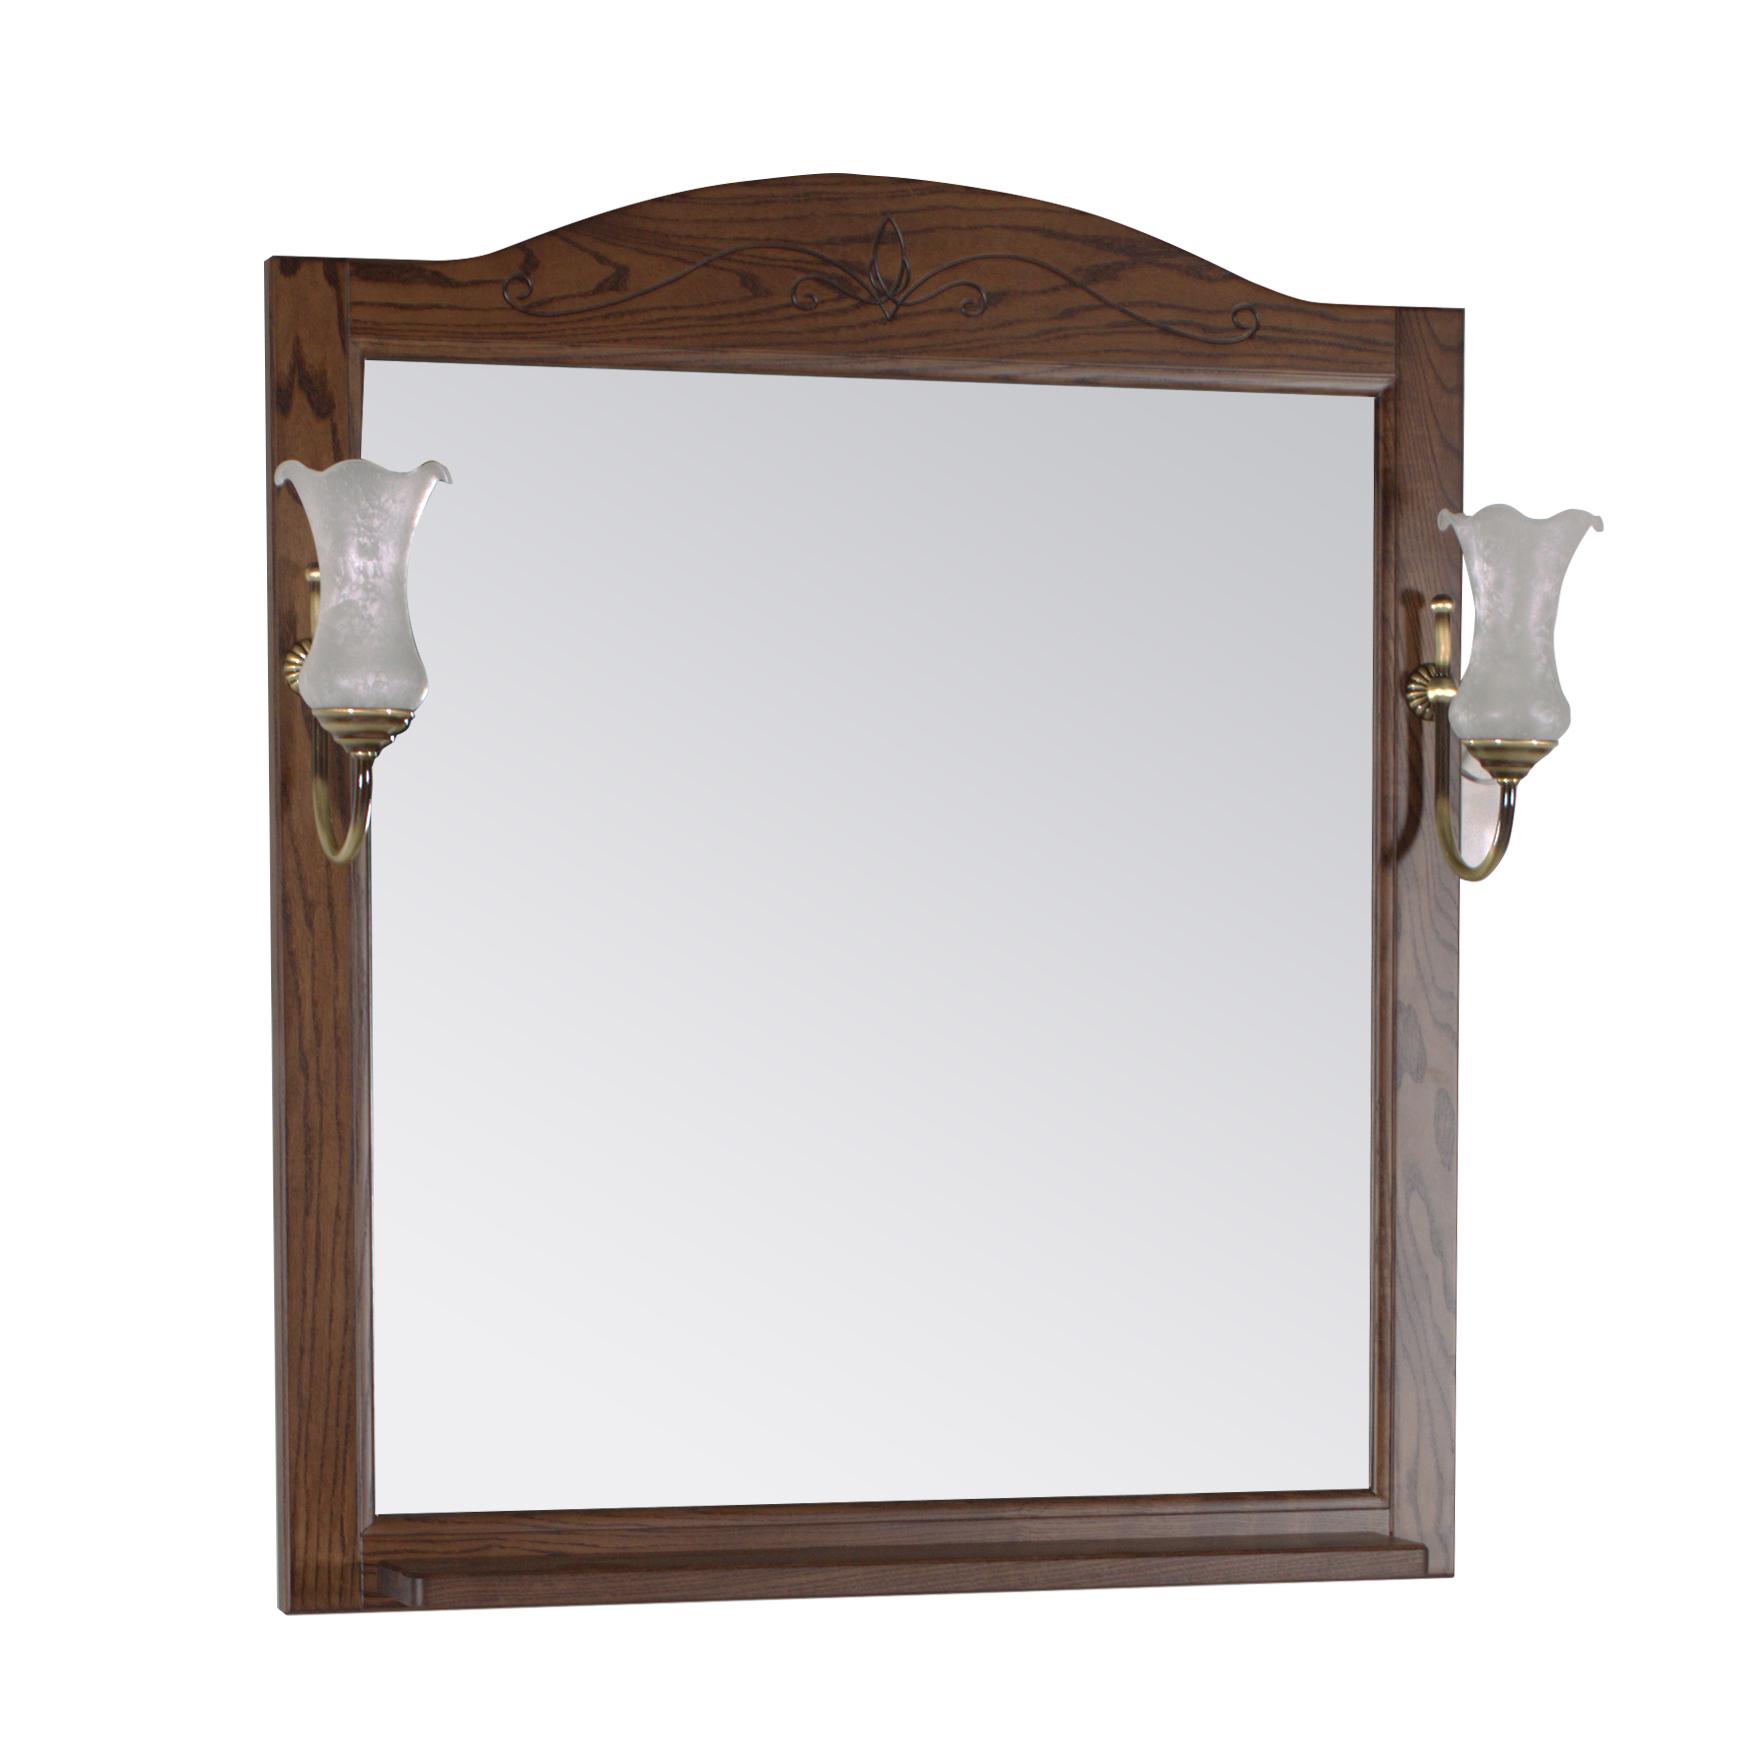 Зеркало АСБ мебель Салерно Woodline антикварный орех